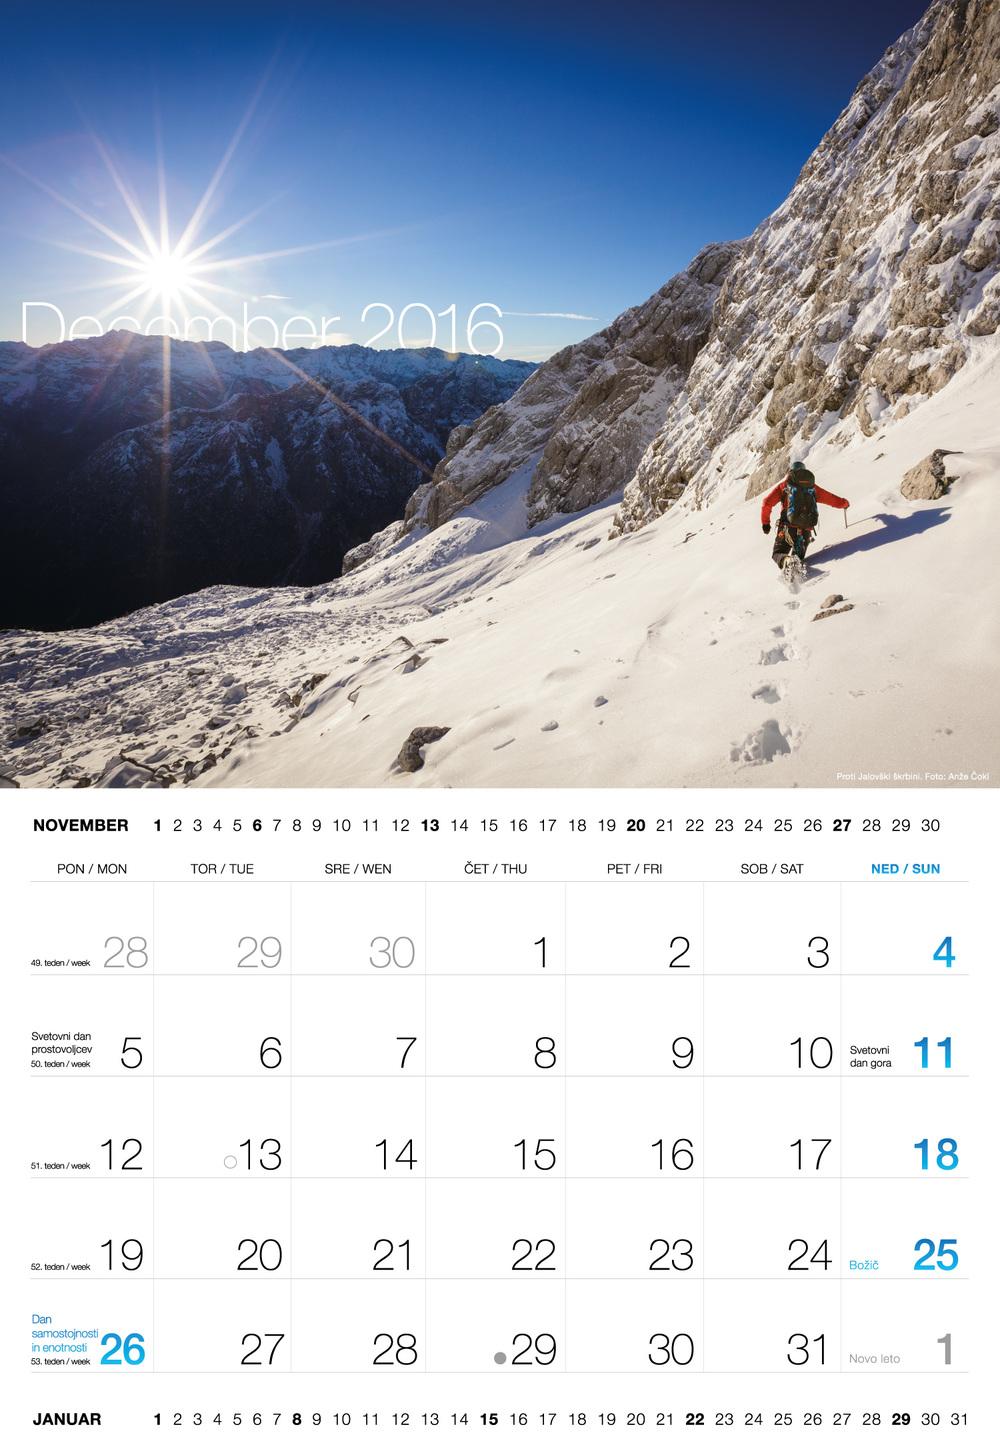 Planinski koledar 2016